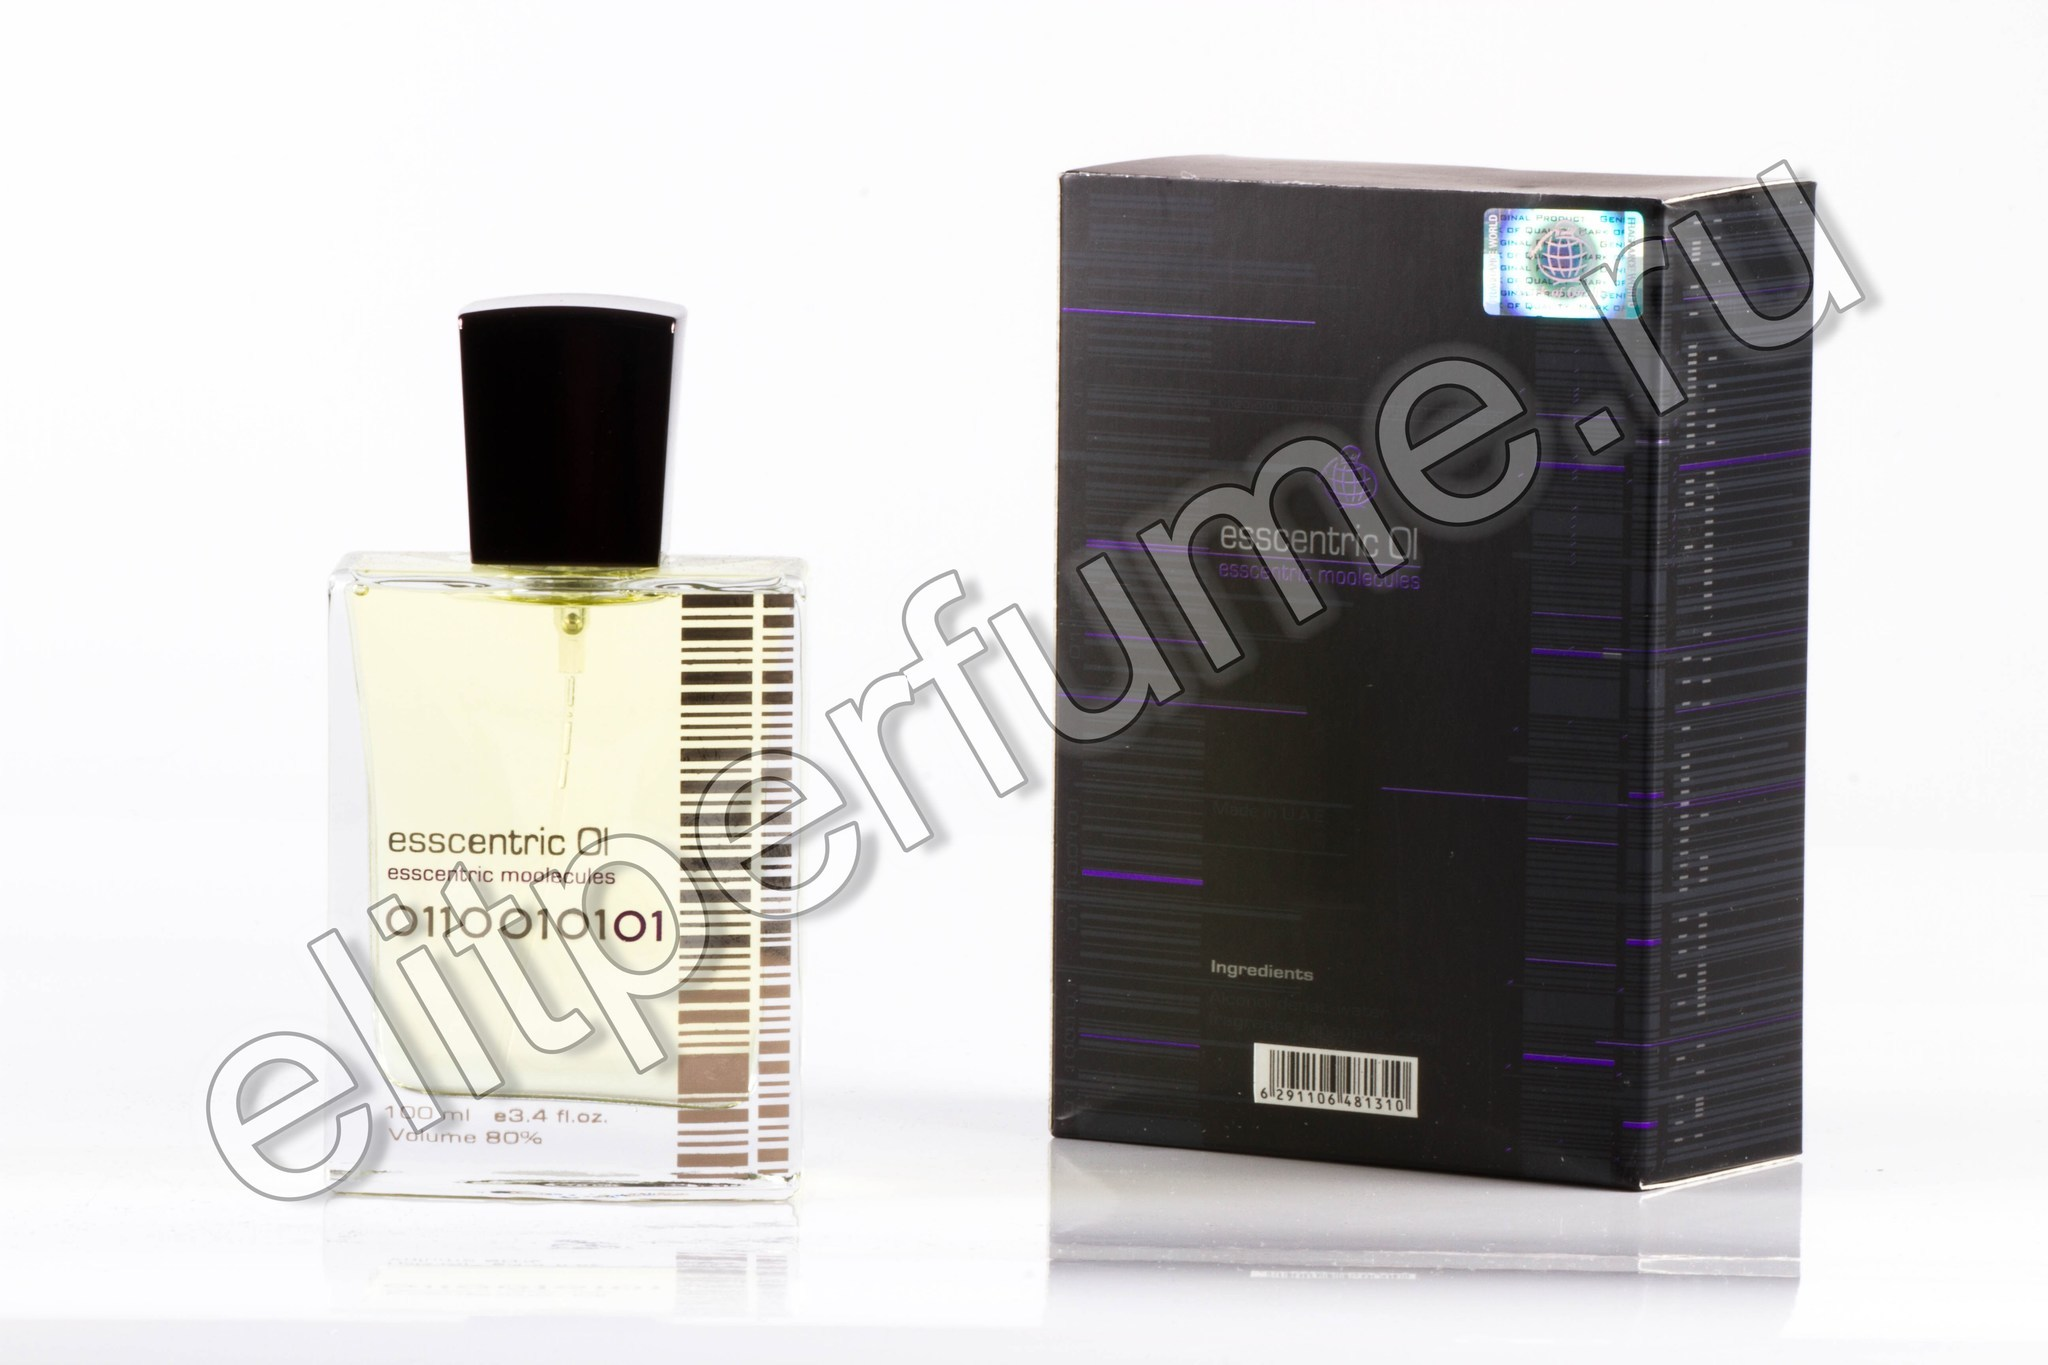 Пробники для Esscentric 01 1 мл спрей от Фрагранс Ворлд Fragrance world